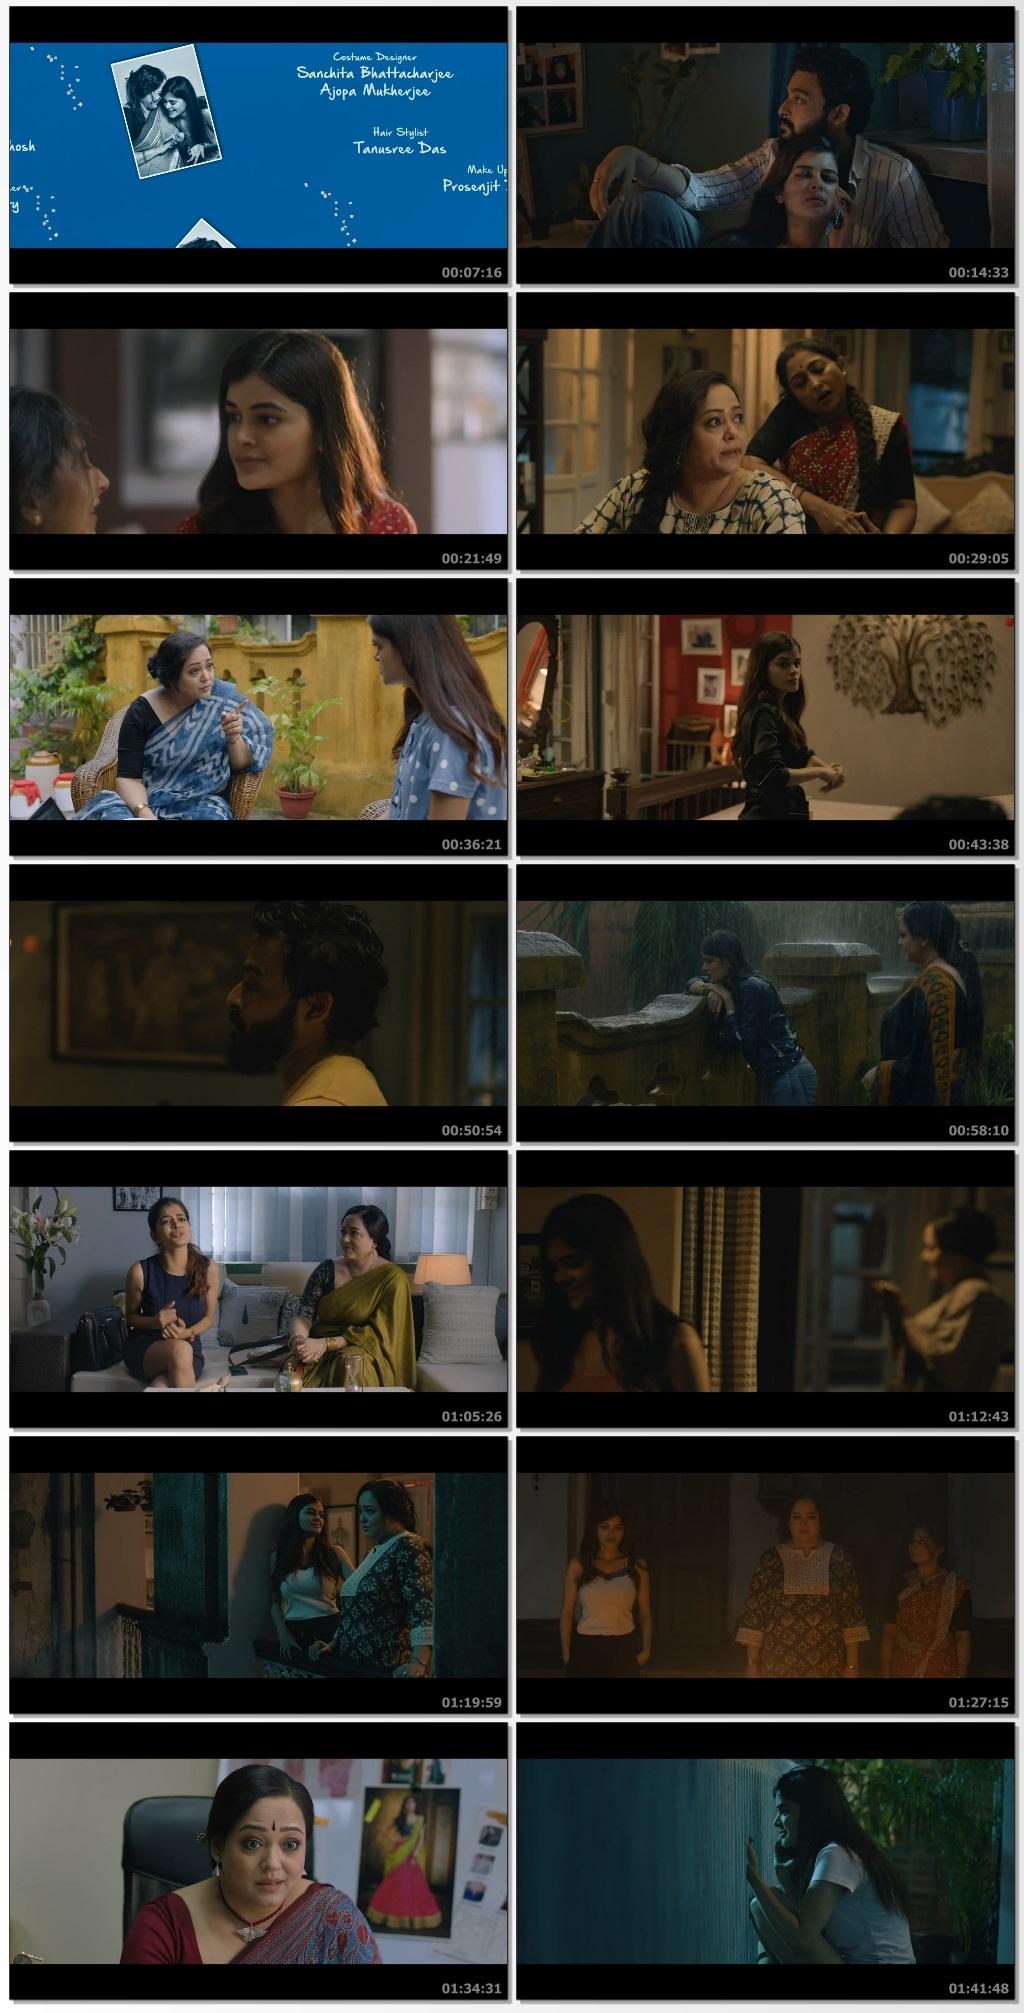 Cheeni-2020-Bengali-720p-WEB-DL-x264-AAC-800-MB-3kmovies-com-mkv-thumbs